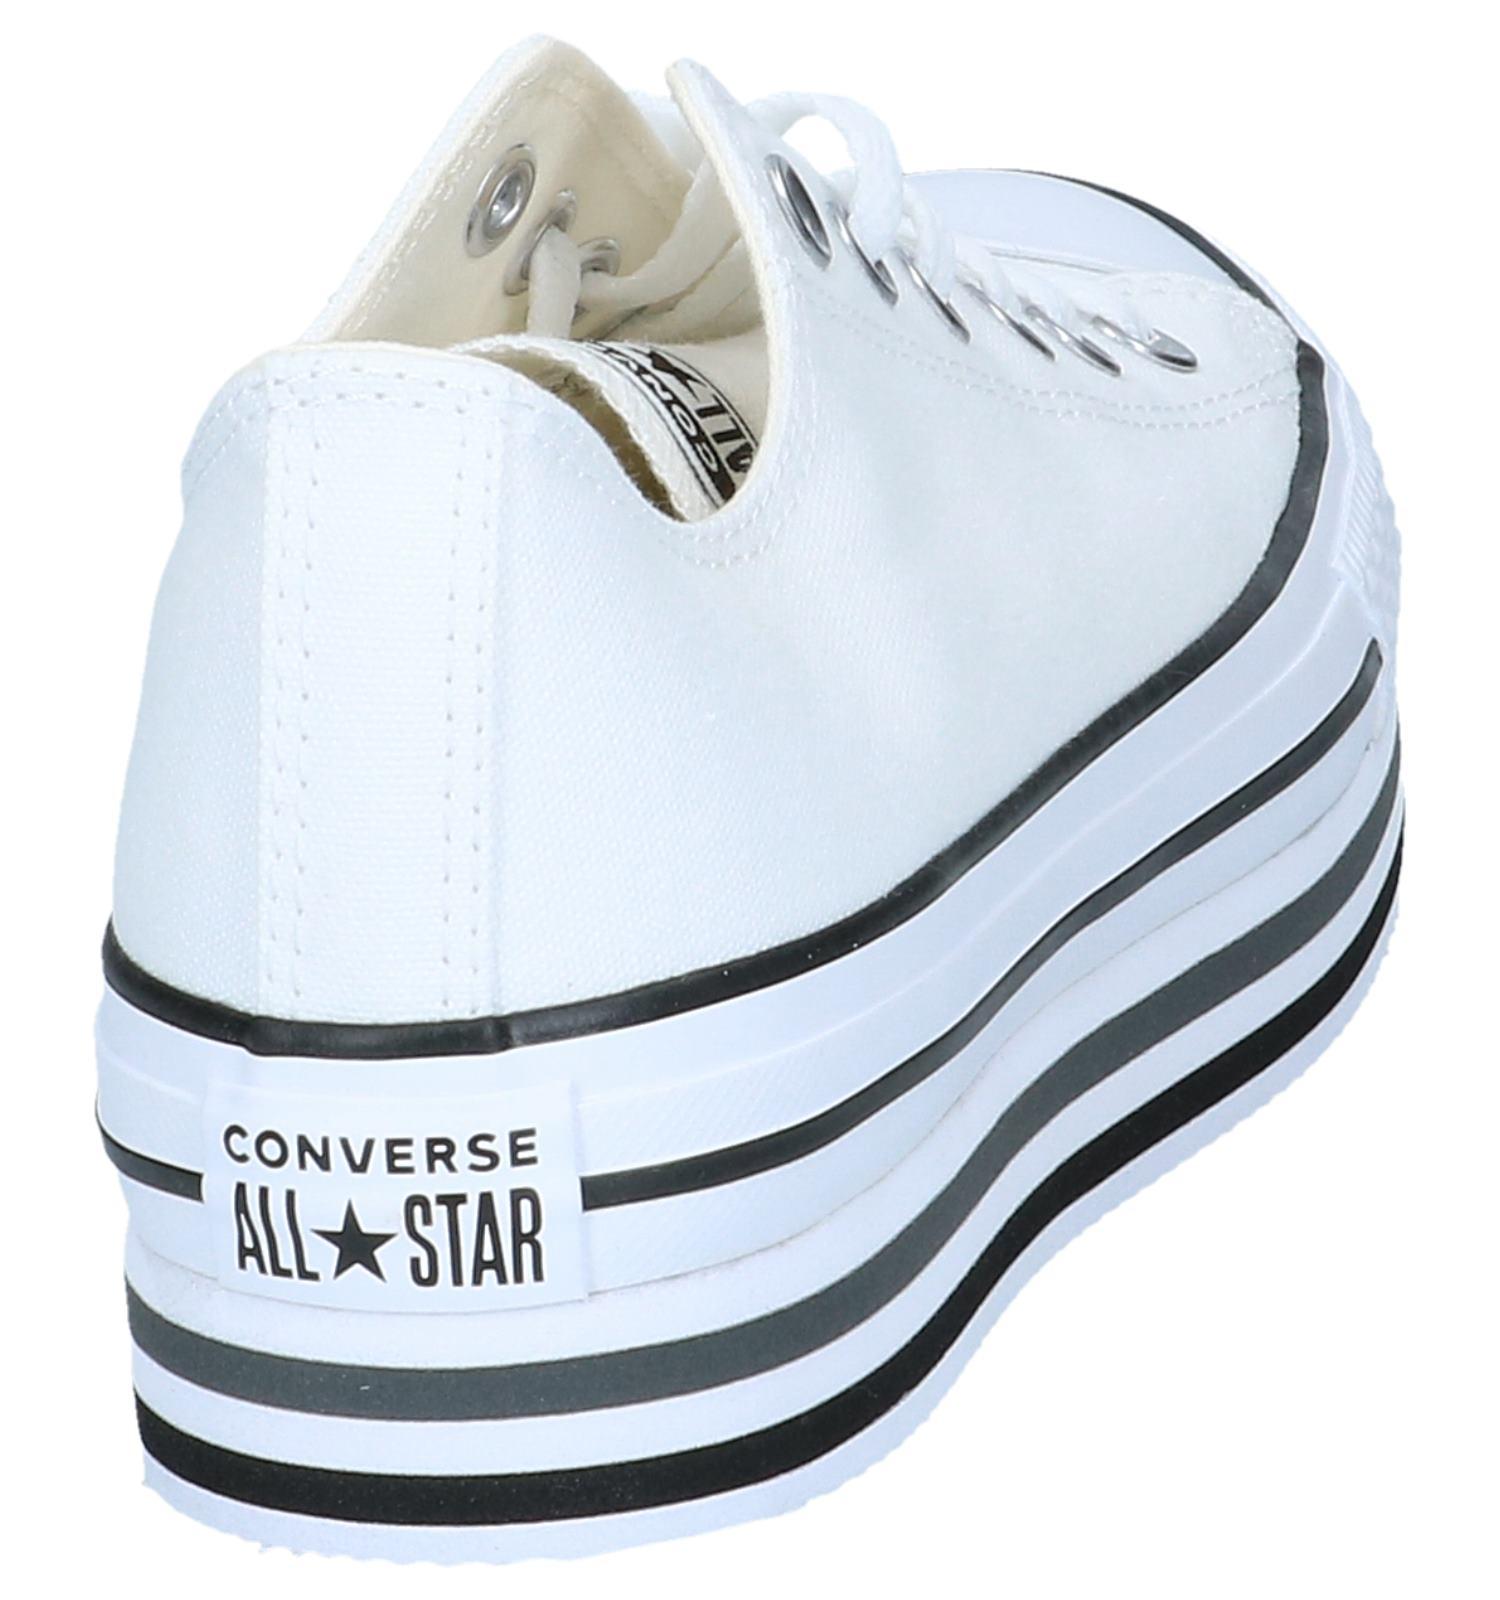 2132fbb0e9e Witte Sneakers Converse All Star Chuck Taylor Platform Layer | TORFS.BE |  Gratis verzend en retour